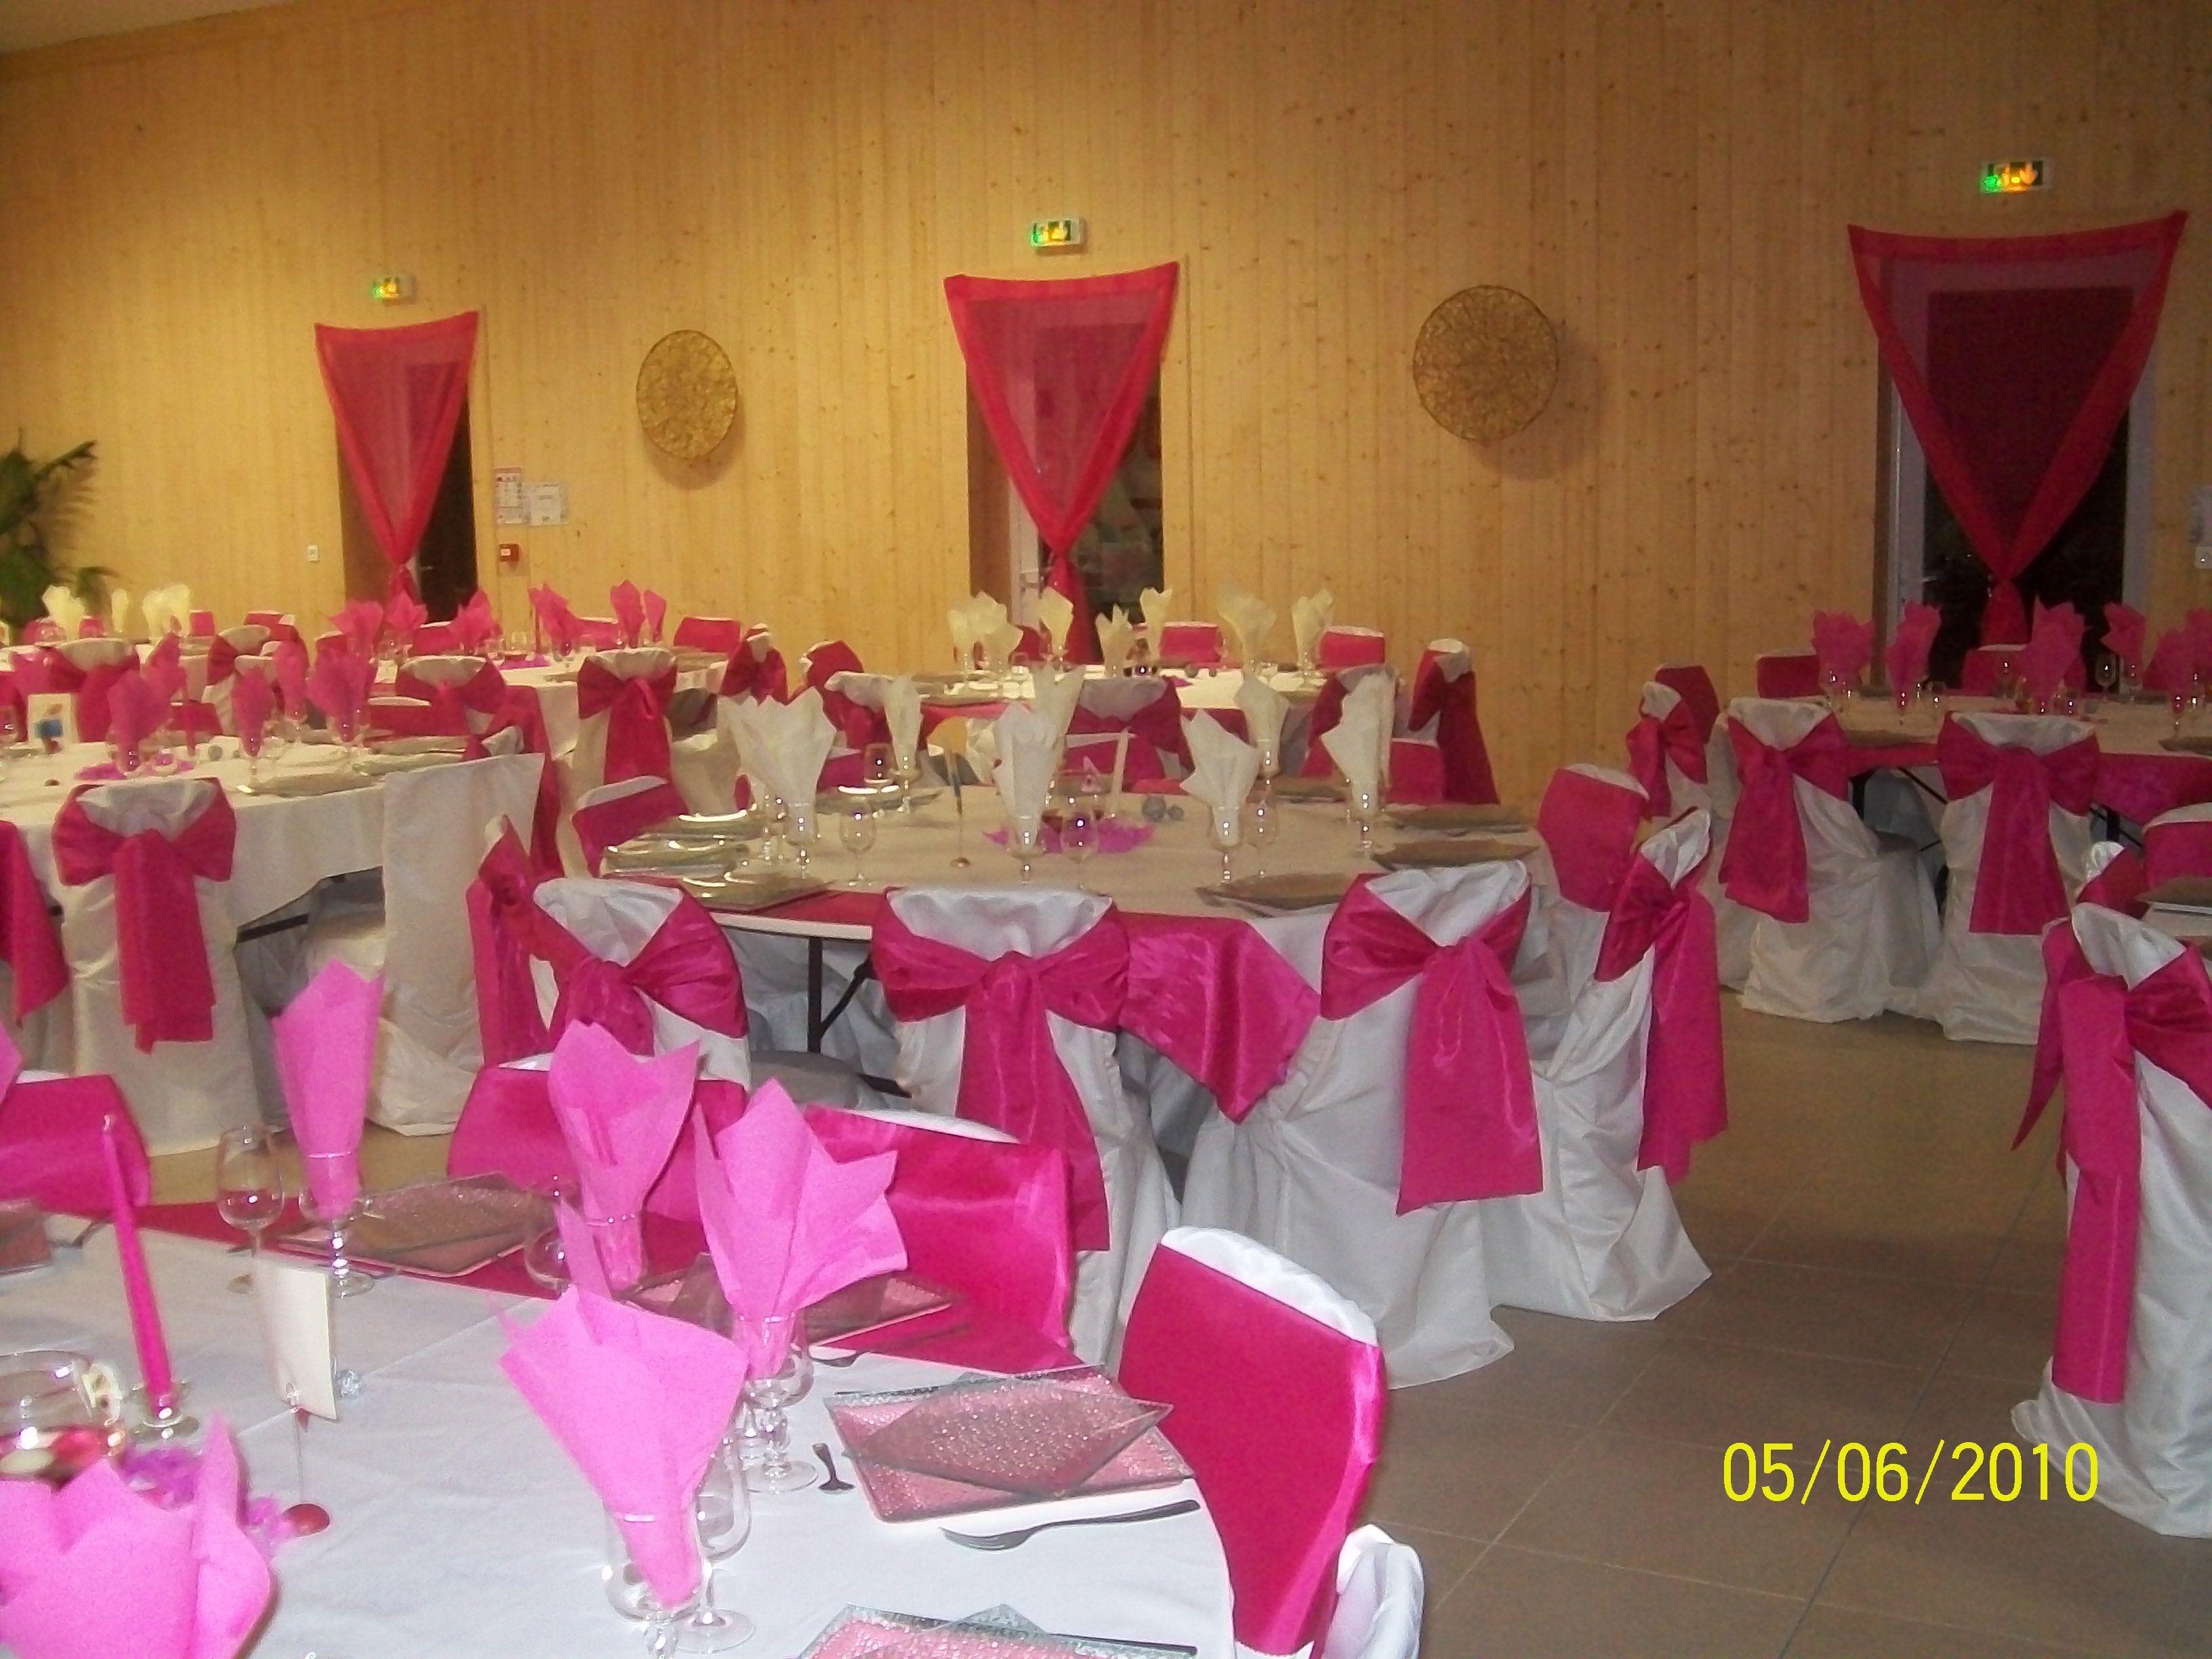 vente decoration mariage marocain id es et d 39 inspiration. Black Bedroom Furniture Sets. Home Design Ideas